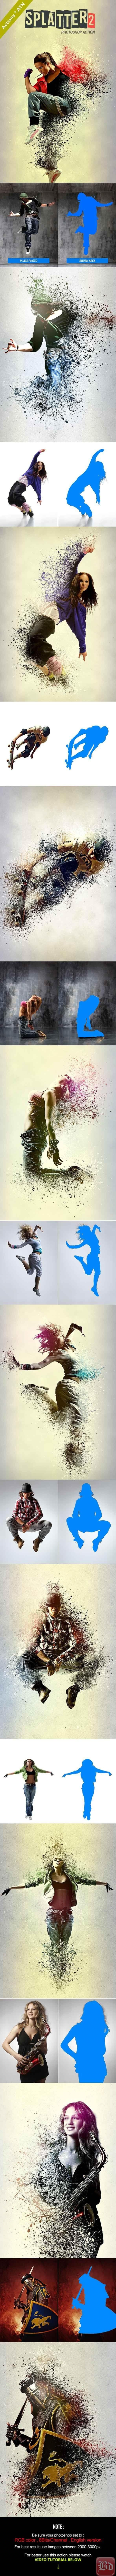 GraphicRiver – Splatter 2 – Photoshop Action 15713159